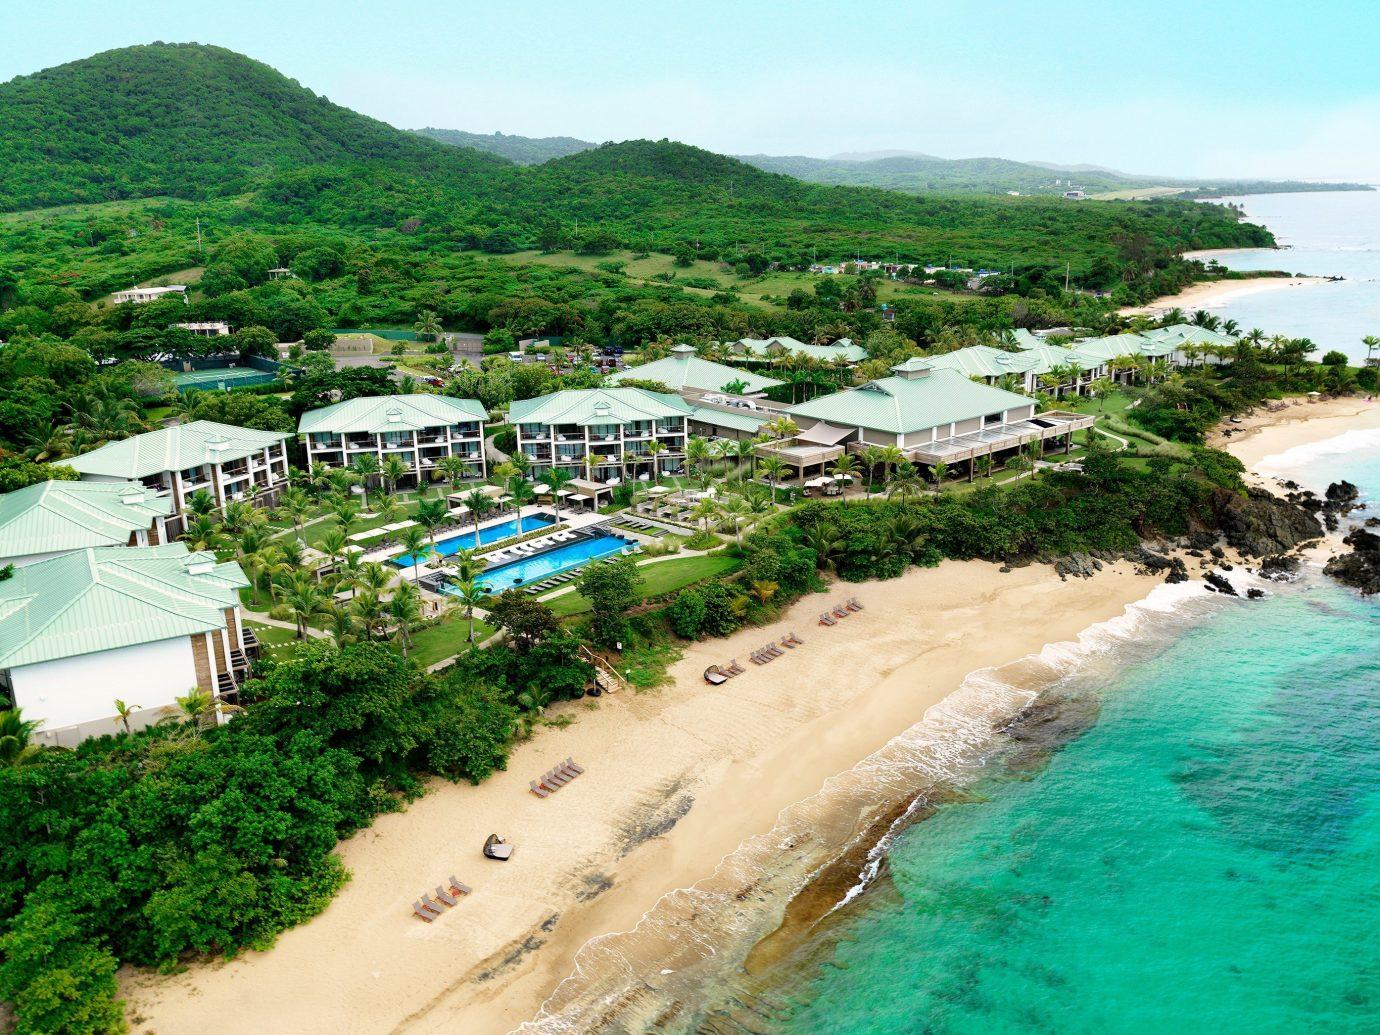 sky outdoor water mountain Beach Nature Coast Resort Sea vacation caribbean bay Water park estate tropics cape Village cove shore swimming sandy